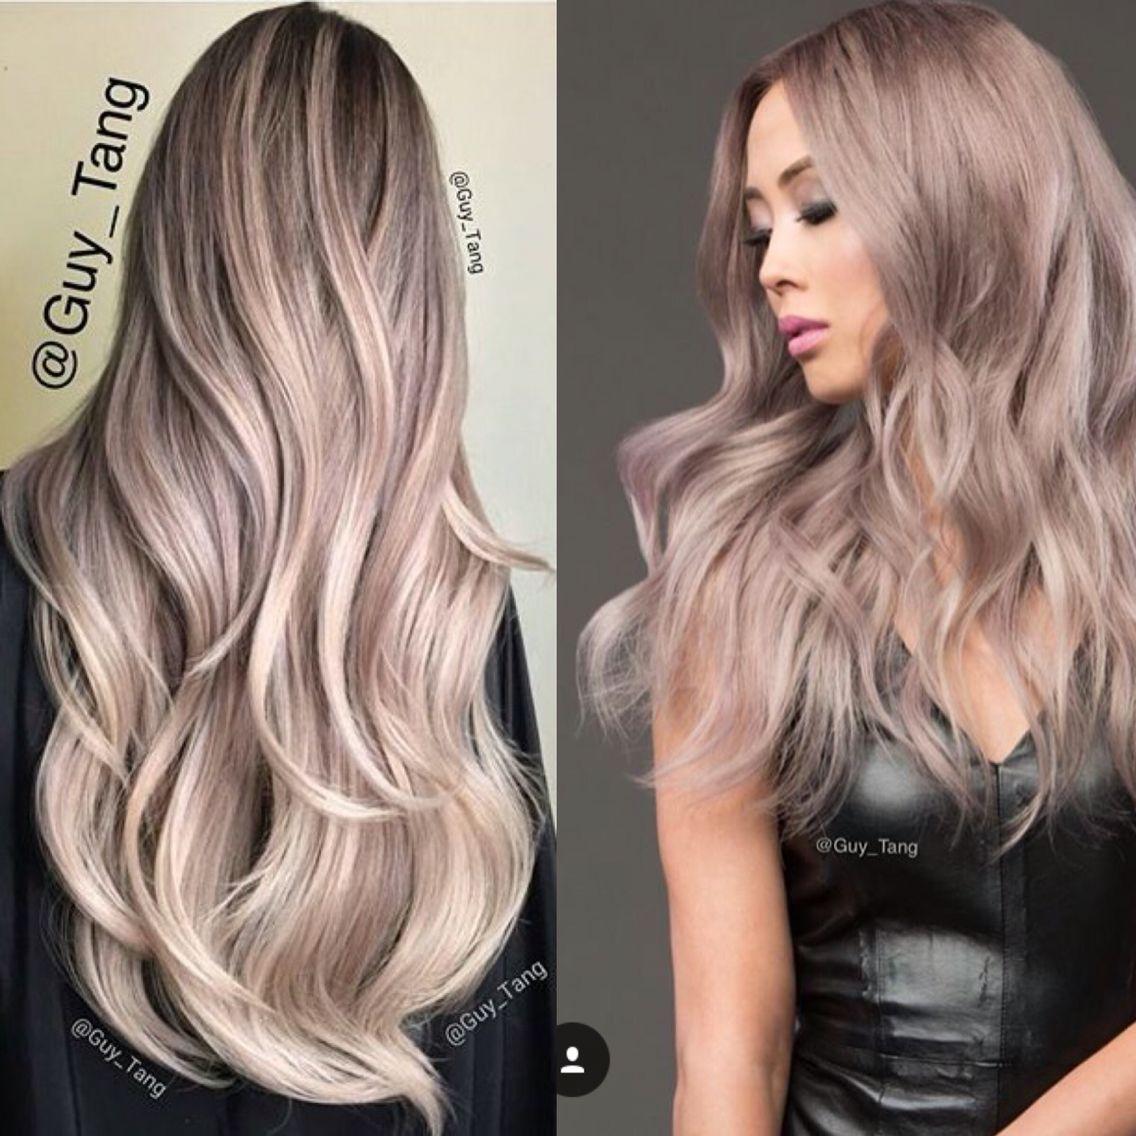 Pearl Balayage Hair Hair Pinterest Balayage Pearls